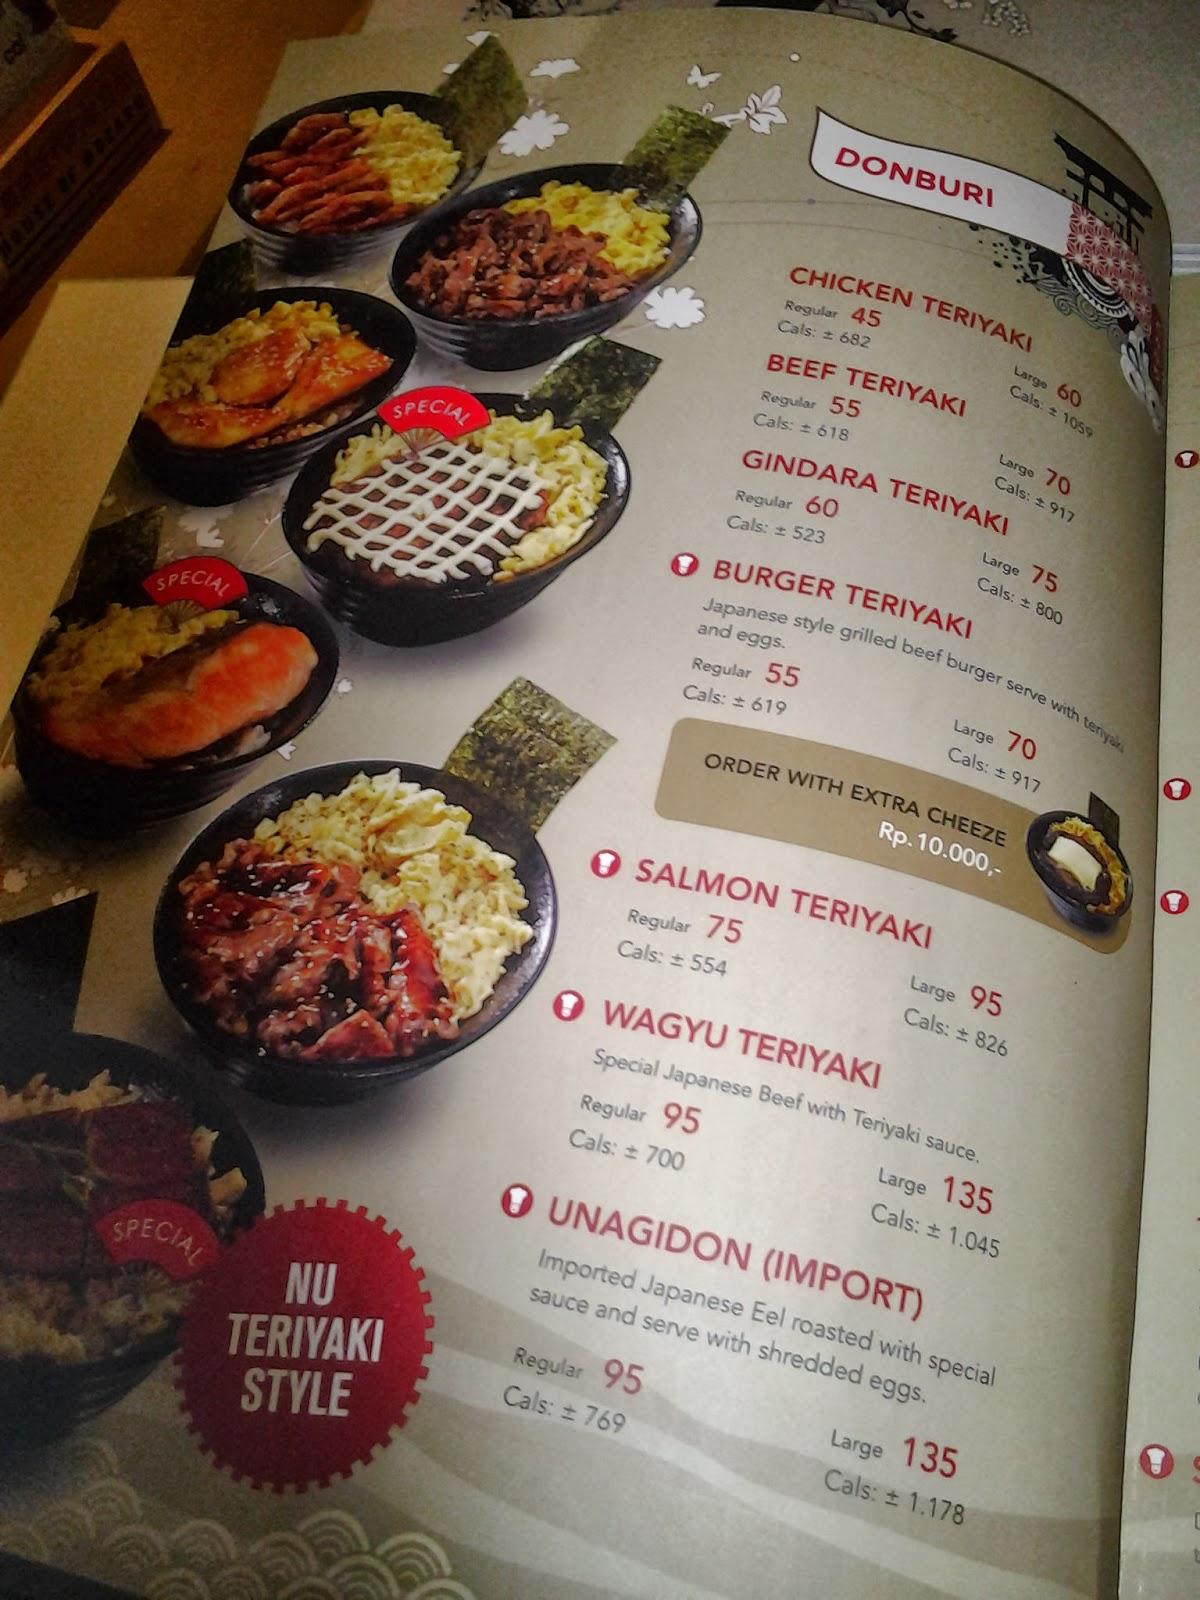 Suka Restaurant Menu